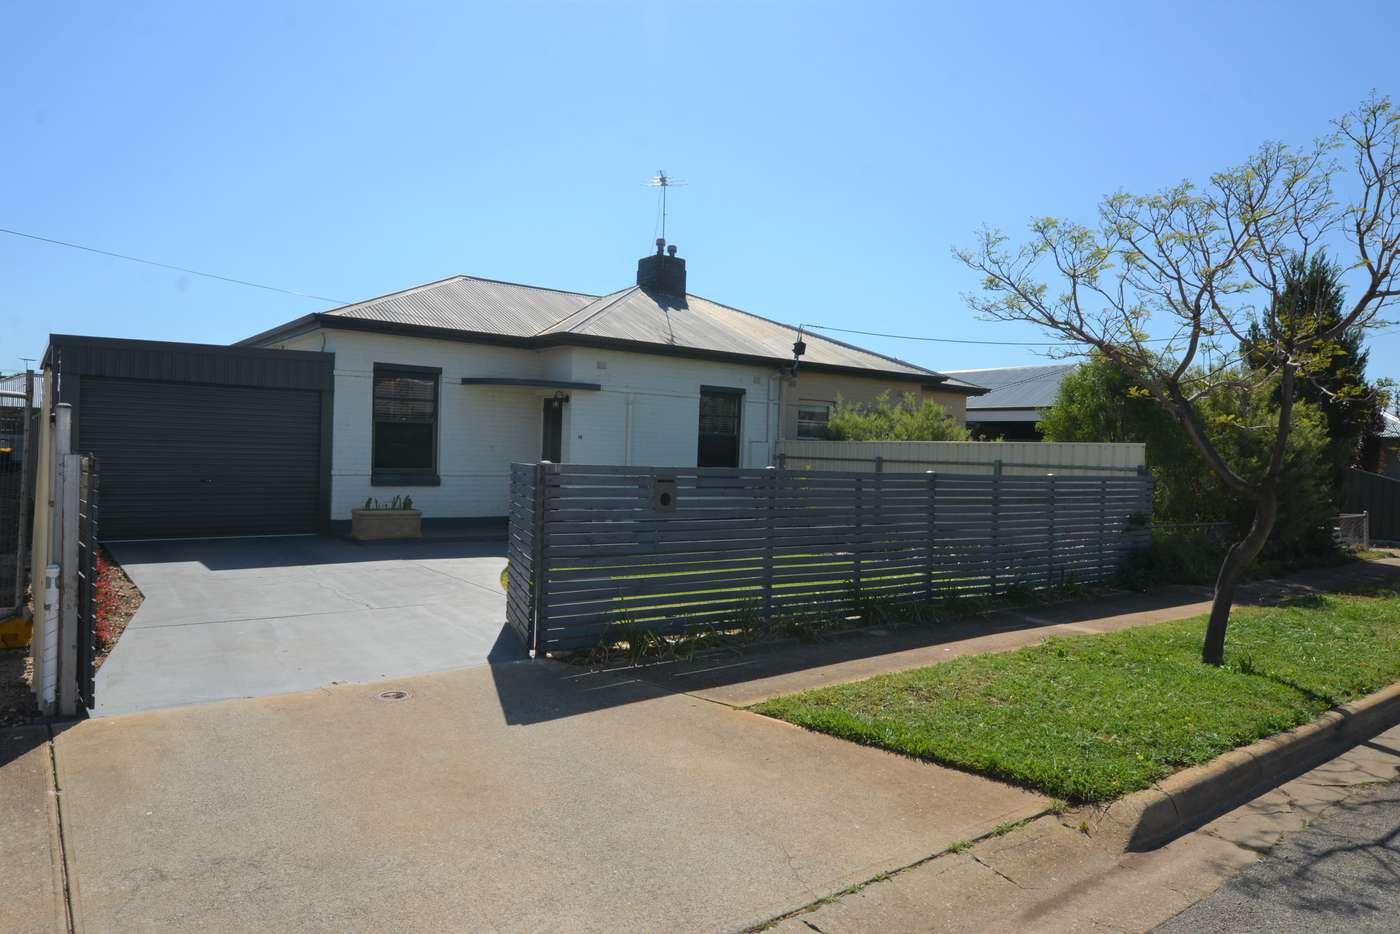 Main view of Homely house listing, 16 Spad Street, Albert Park SA 5014